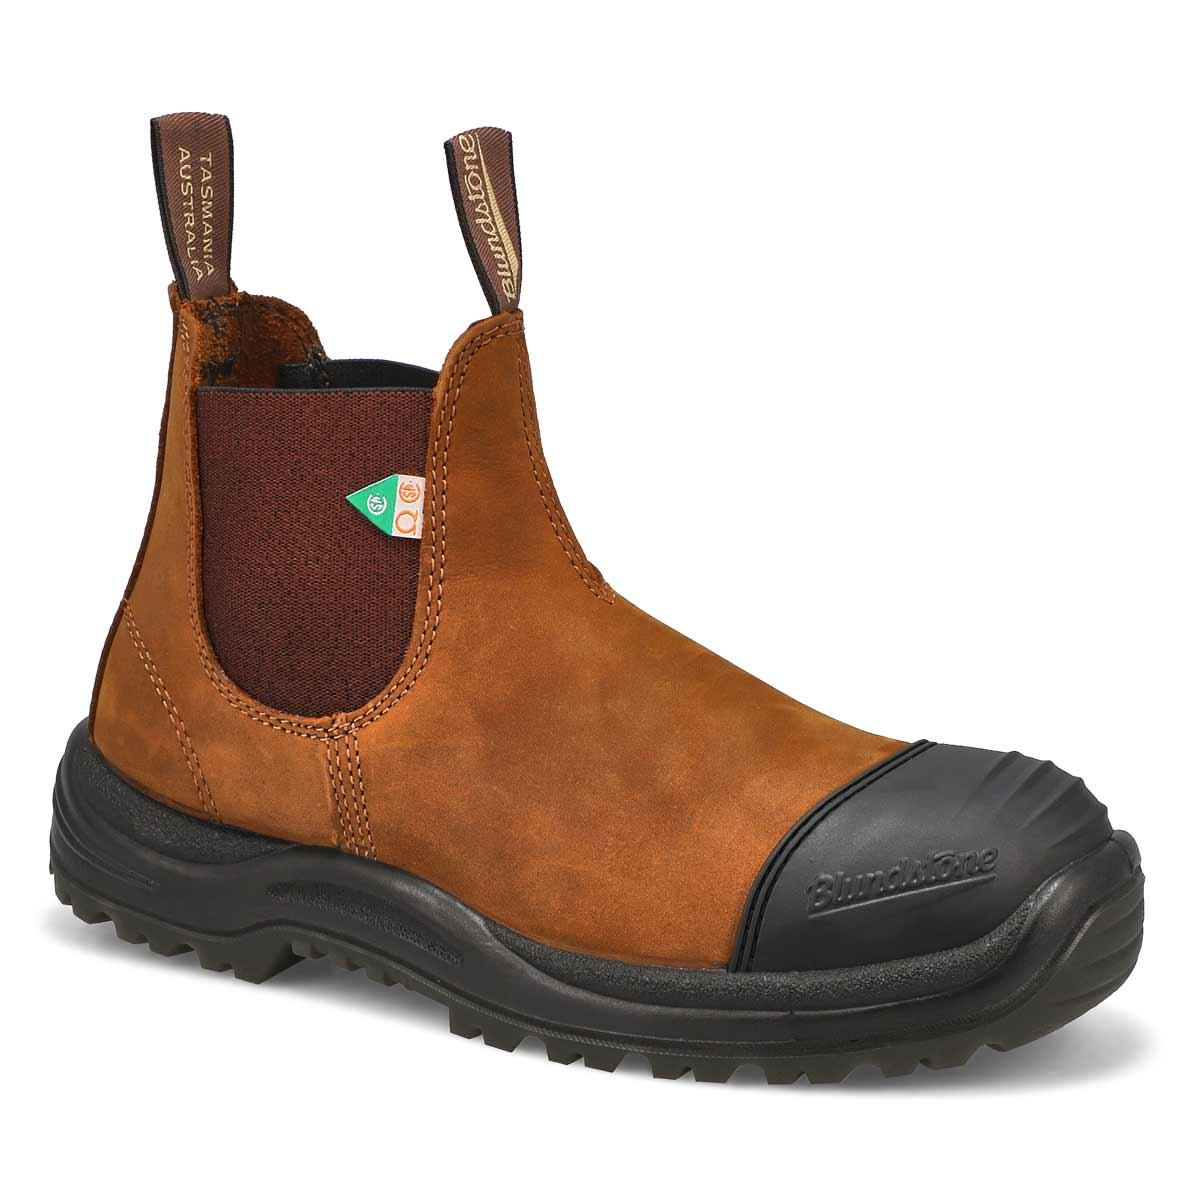 Unisex CSA crazyhorse brn twin gore boot